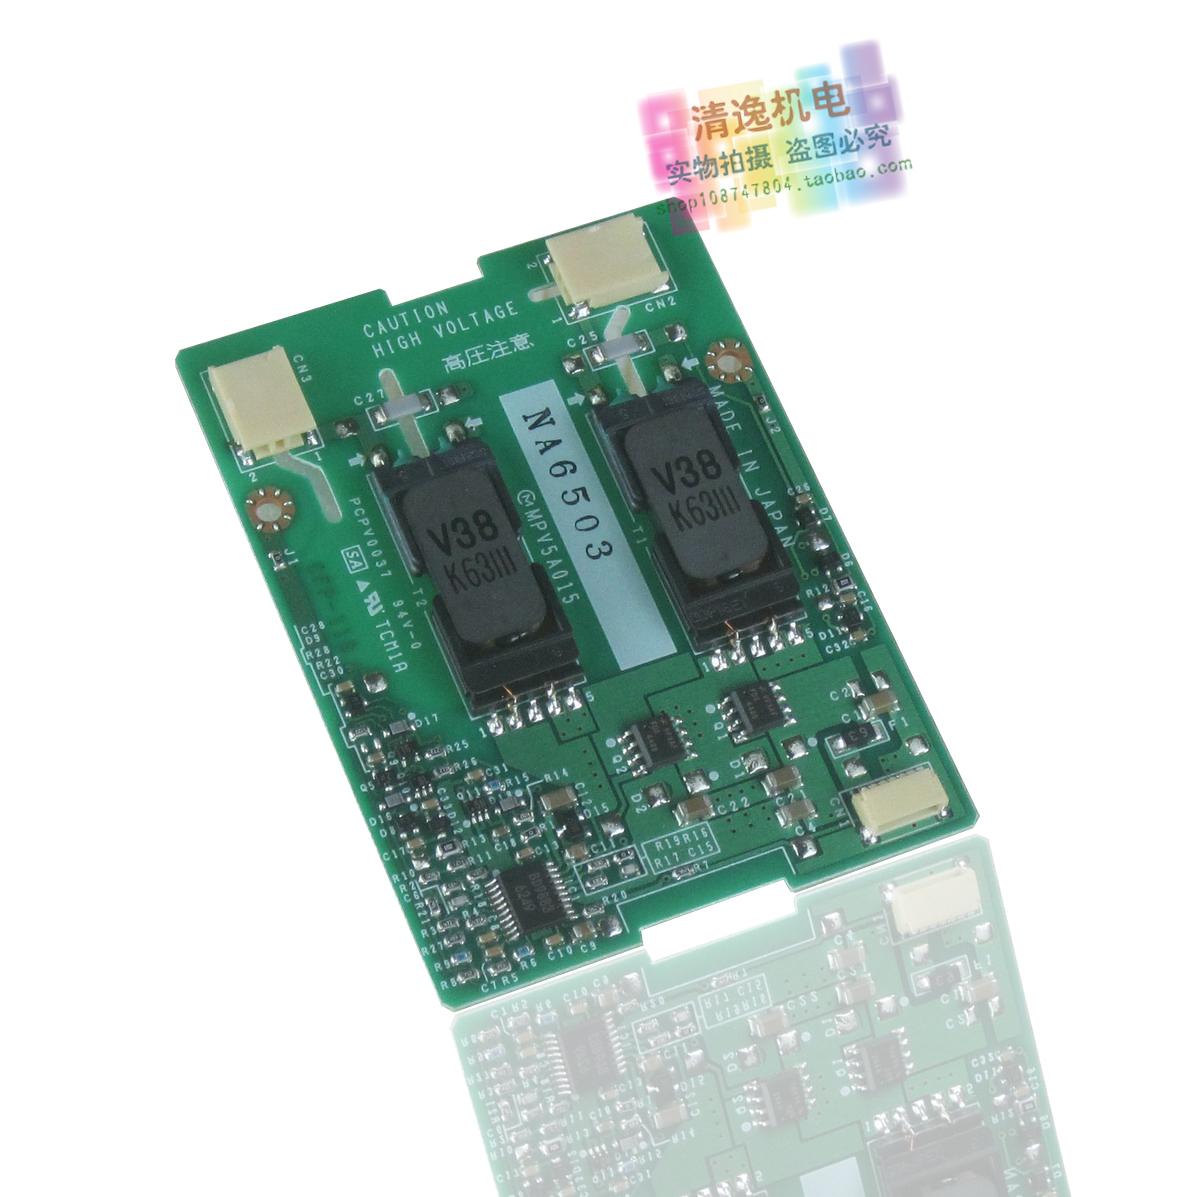 正品现货 MPV5A015 PCPV0037 94V-0 板